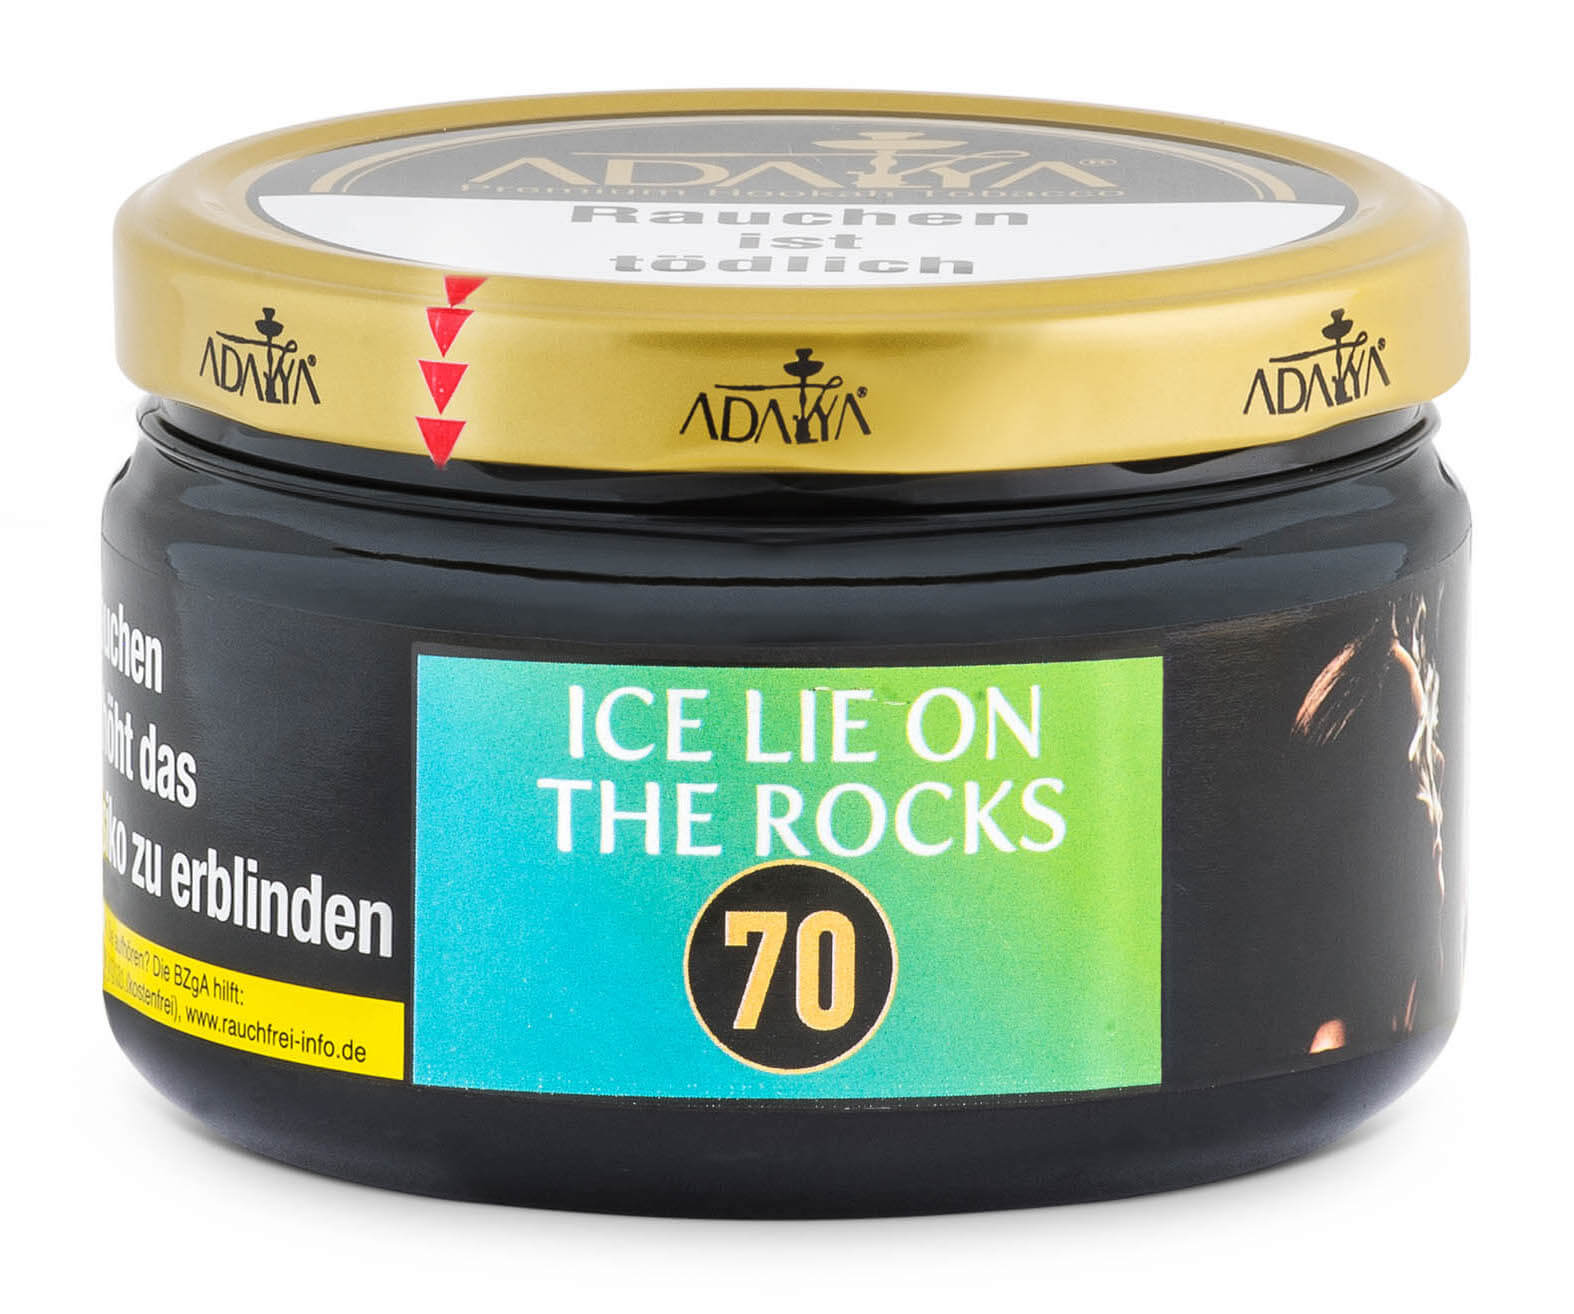 Adalya Tabak Ice Lie on the Rocks #70 200g